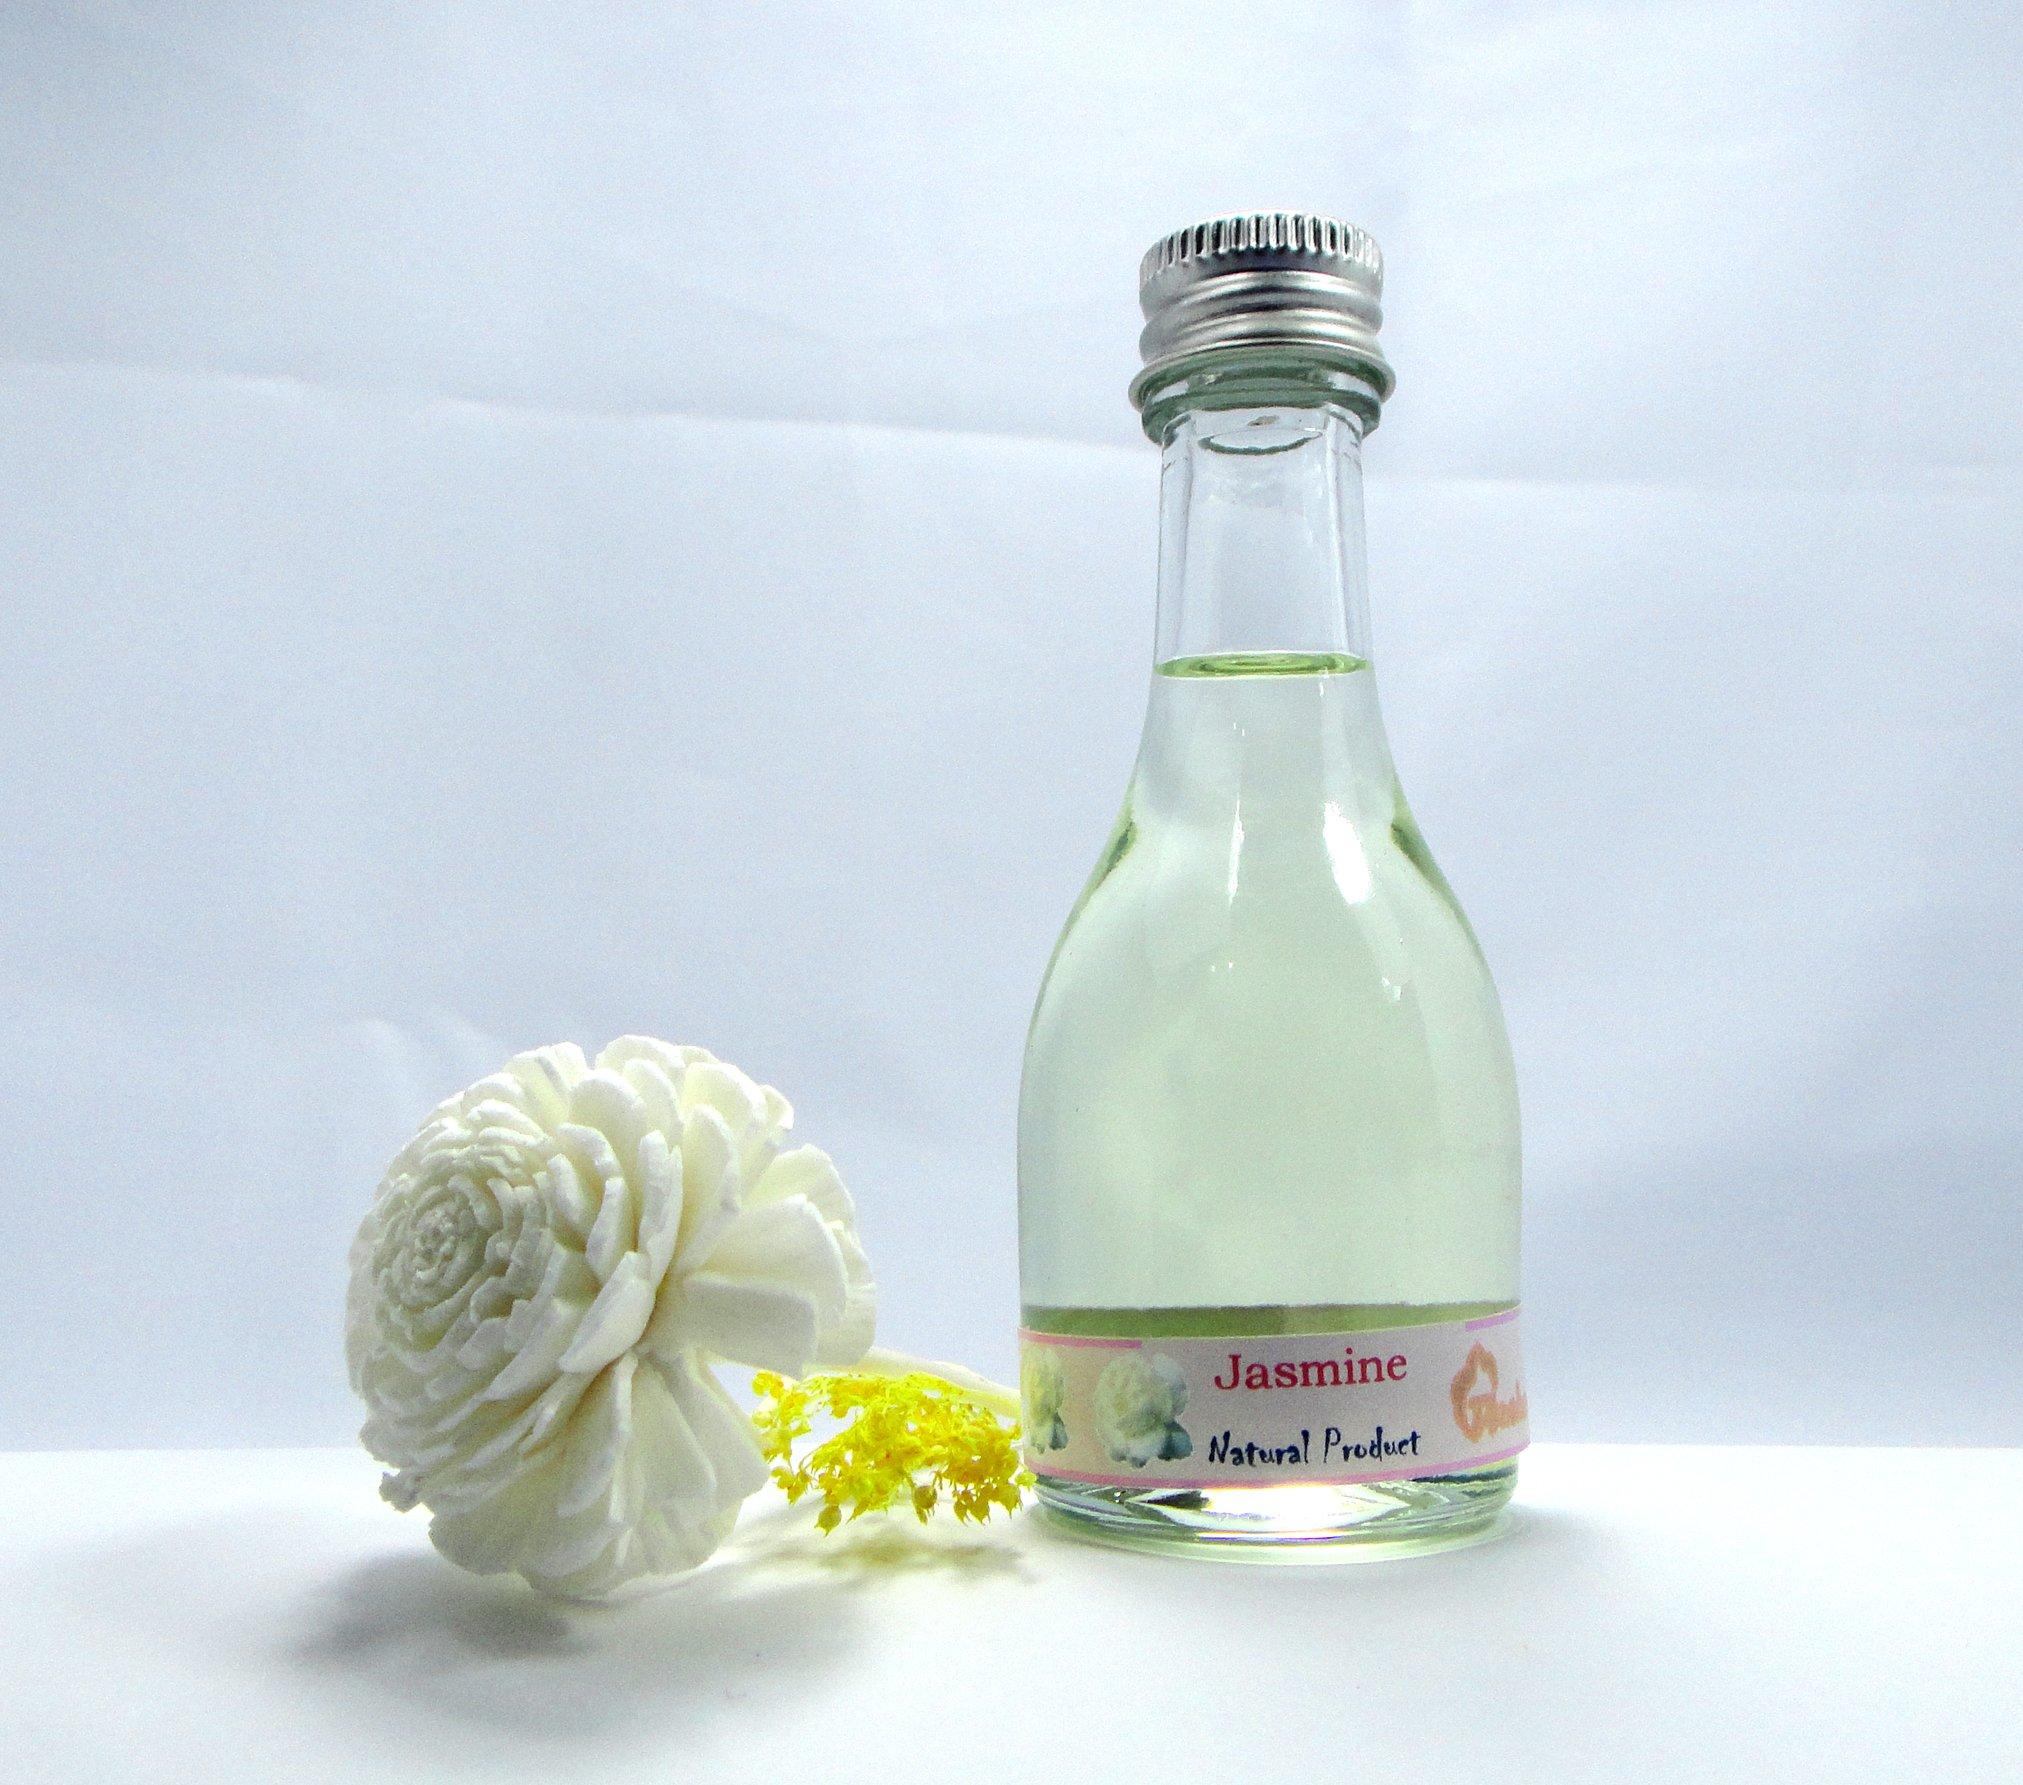 JASMINE Reed Diffuser Fragrance Essential Oil Reed Diffuser Jasmine Blossom 30 Ml./1 Oz. by Thailand